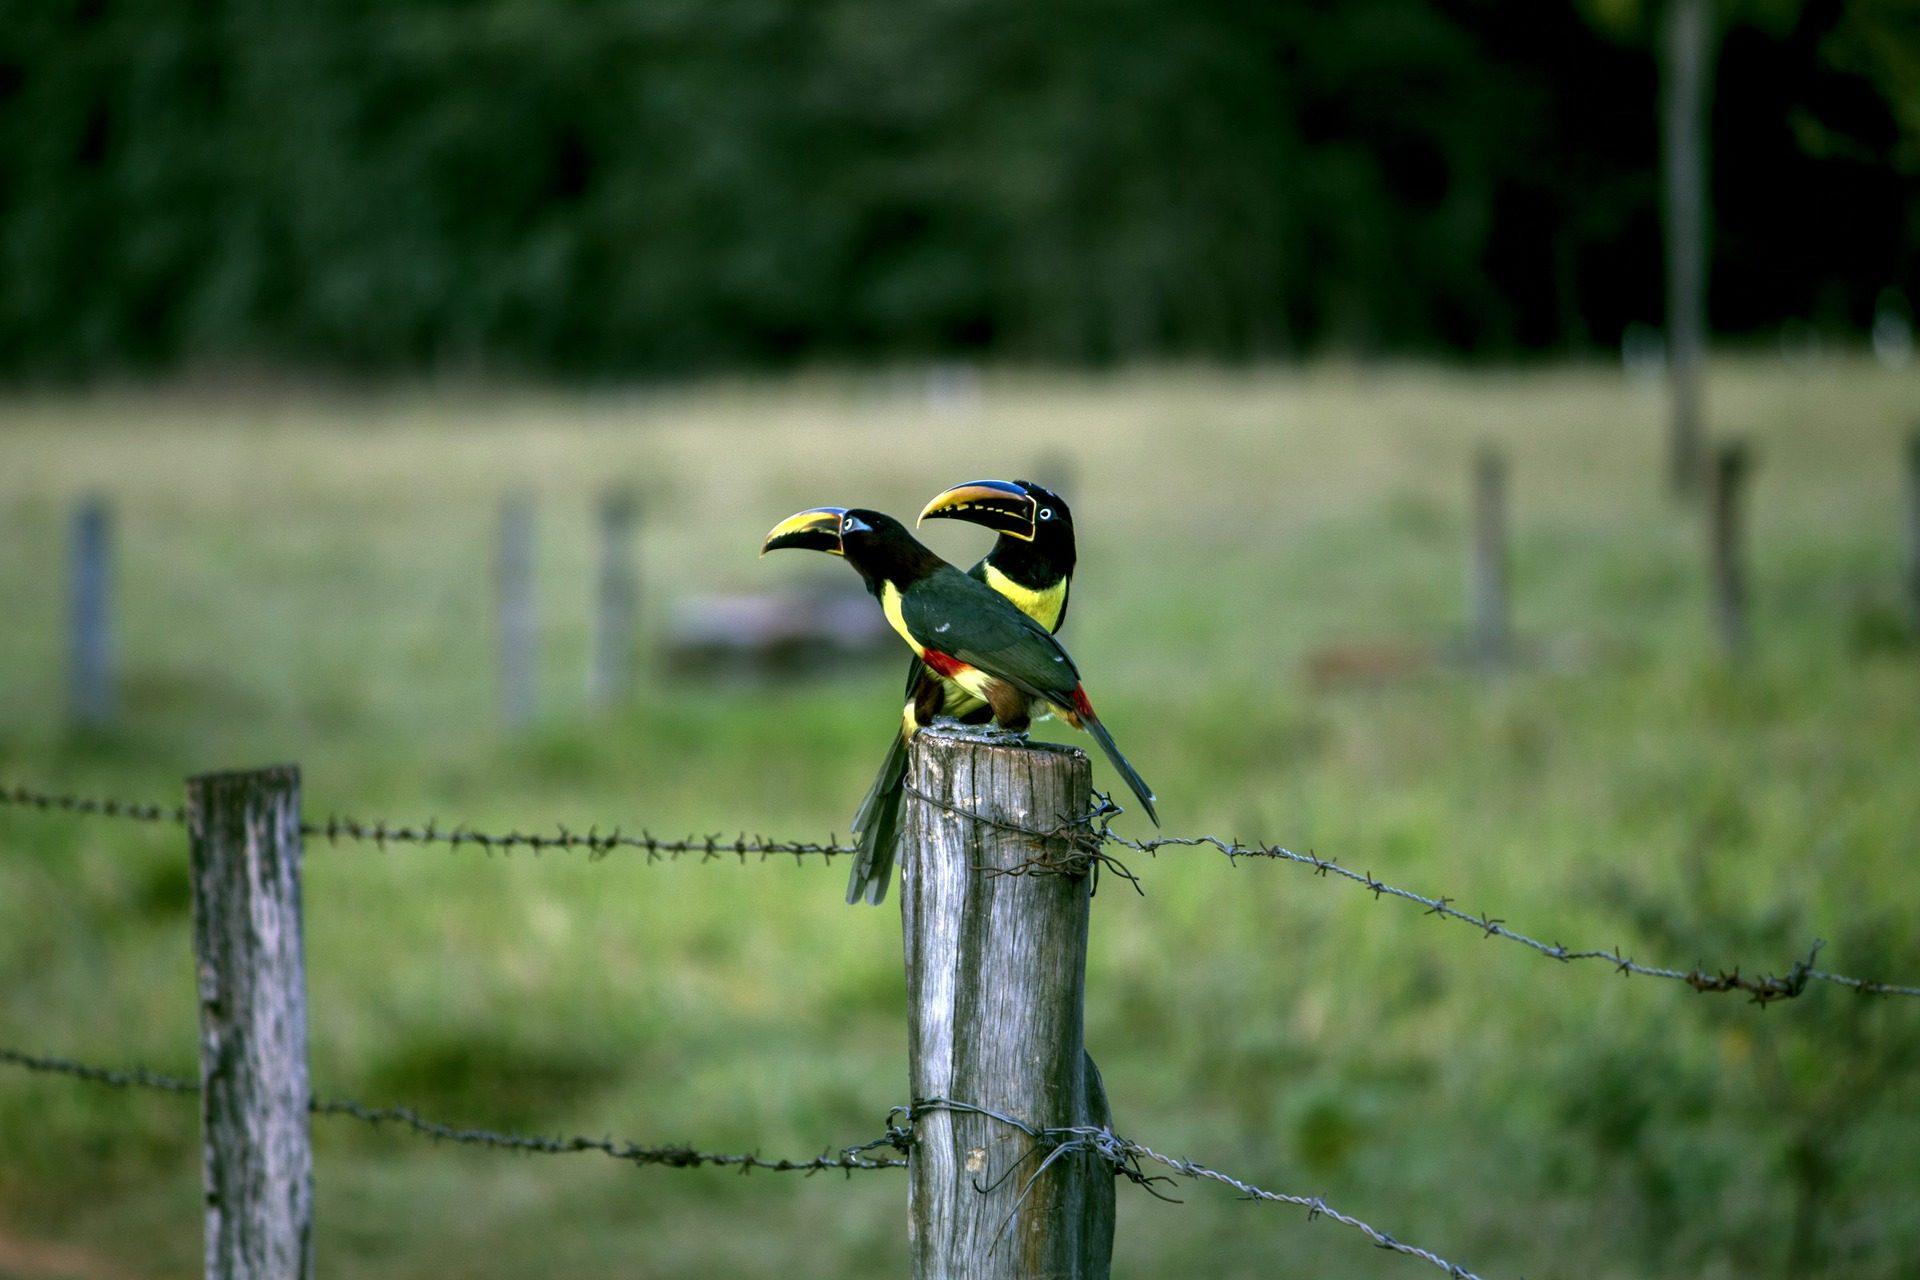 Aracaris, toucans, pájaros, पक्षी, बाड़, पदों, फ़ील्ड - HD वॉलपेपर - प्रोफेसर-falken.com